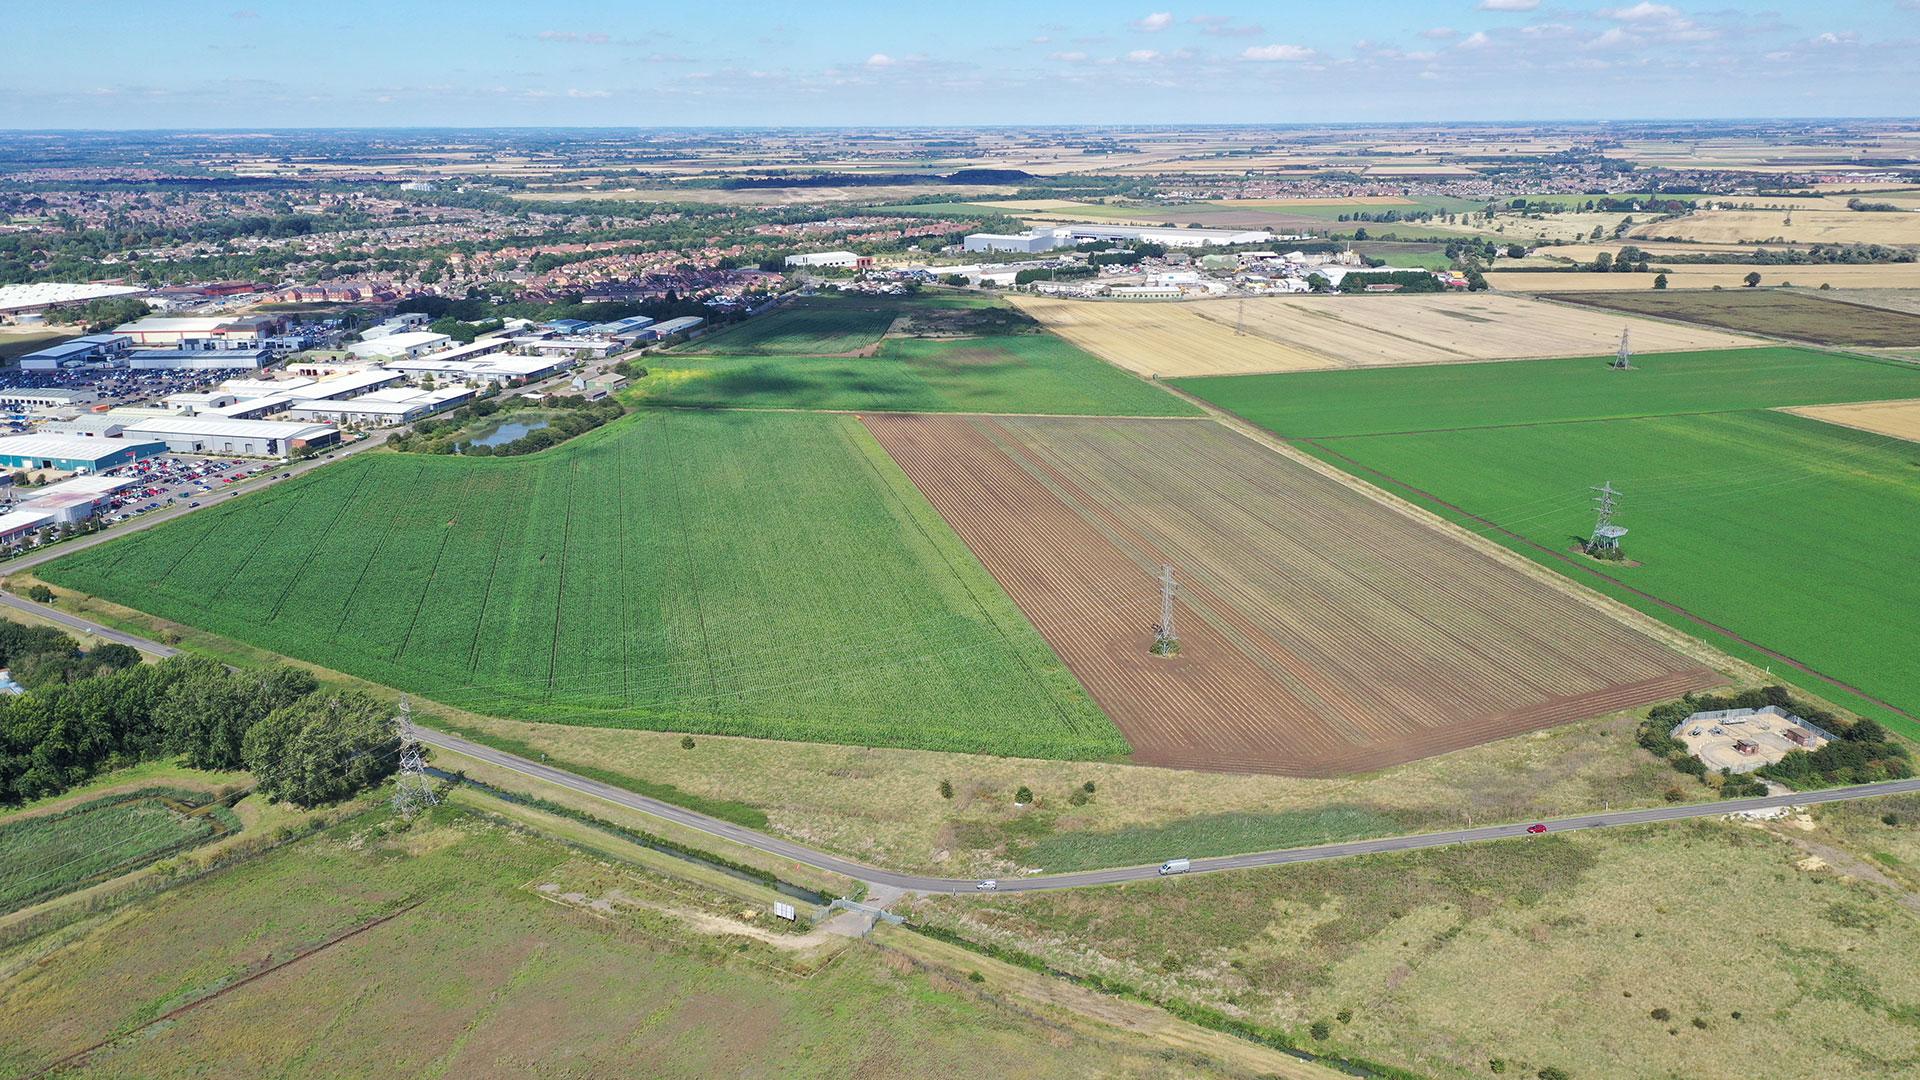 Flagship-Park-Peterborough-24th-August-2020-(1)